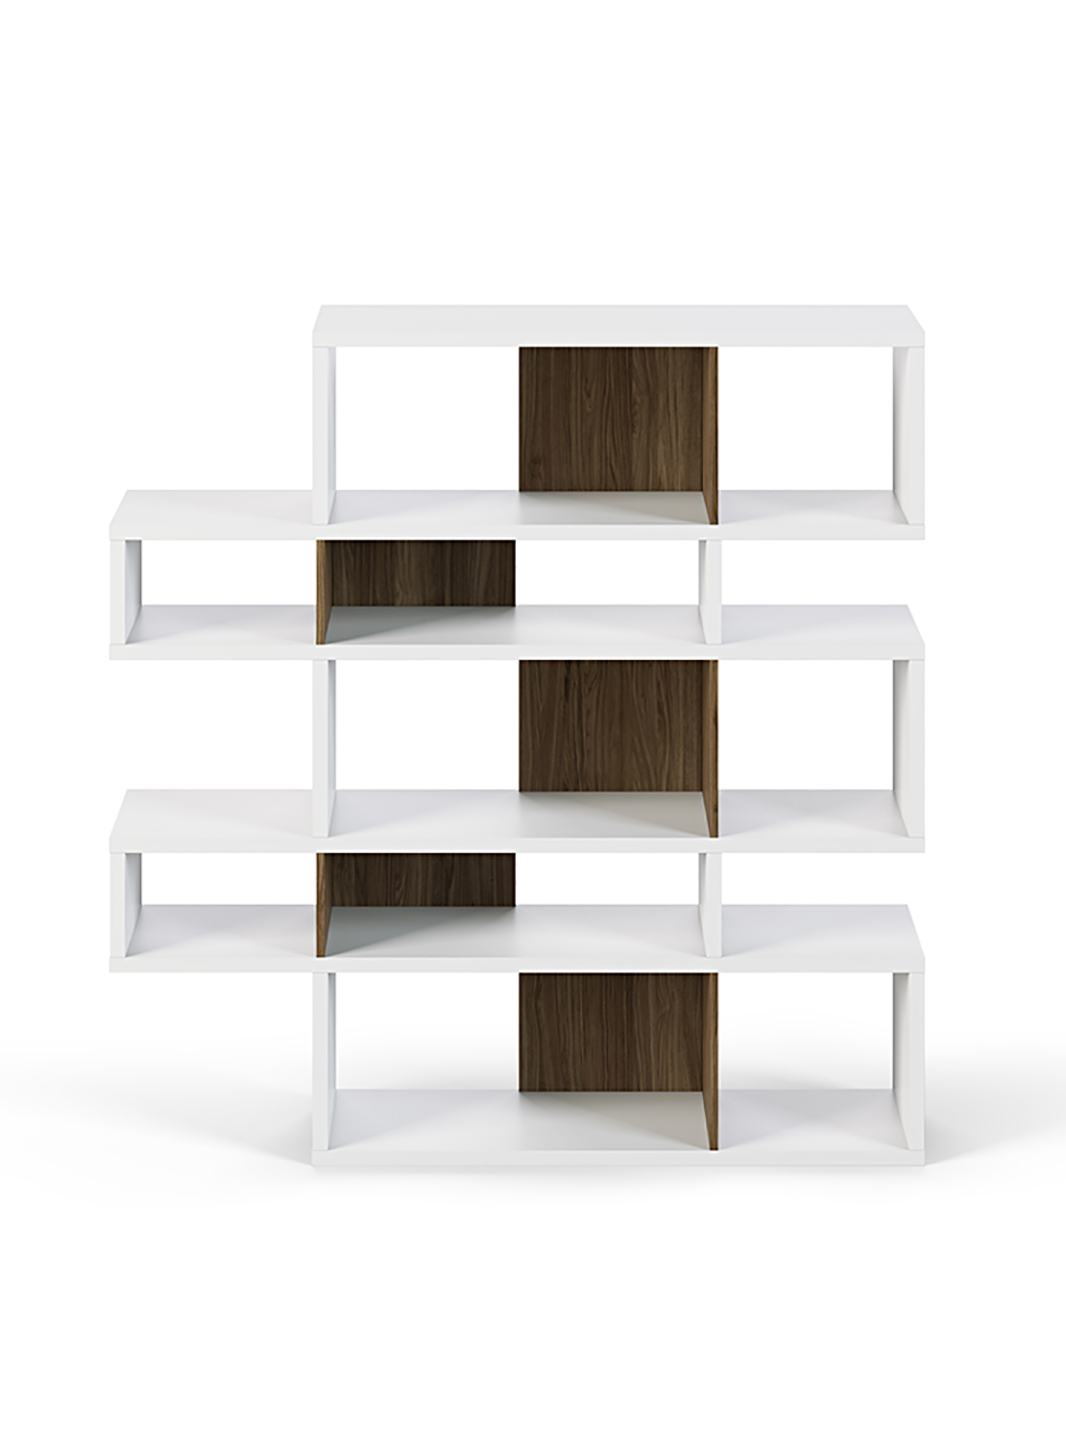 london tag re mariette clermont. Black Bedroom Furniture Sets. Home Design Ideas